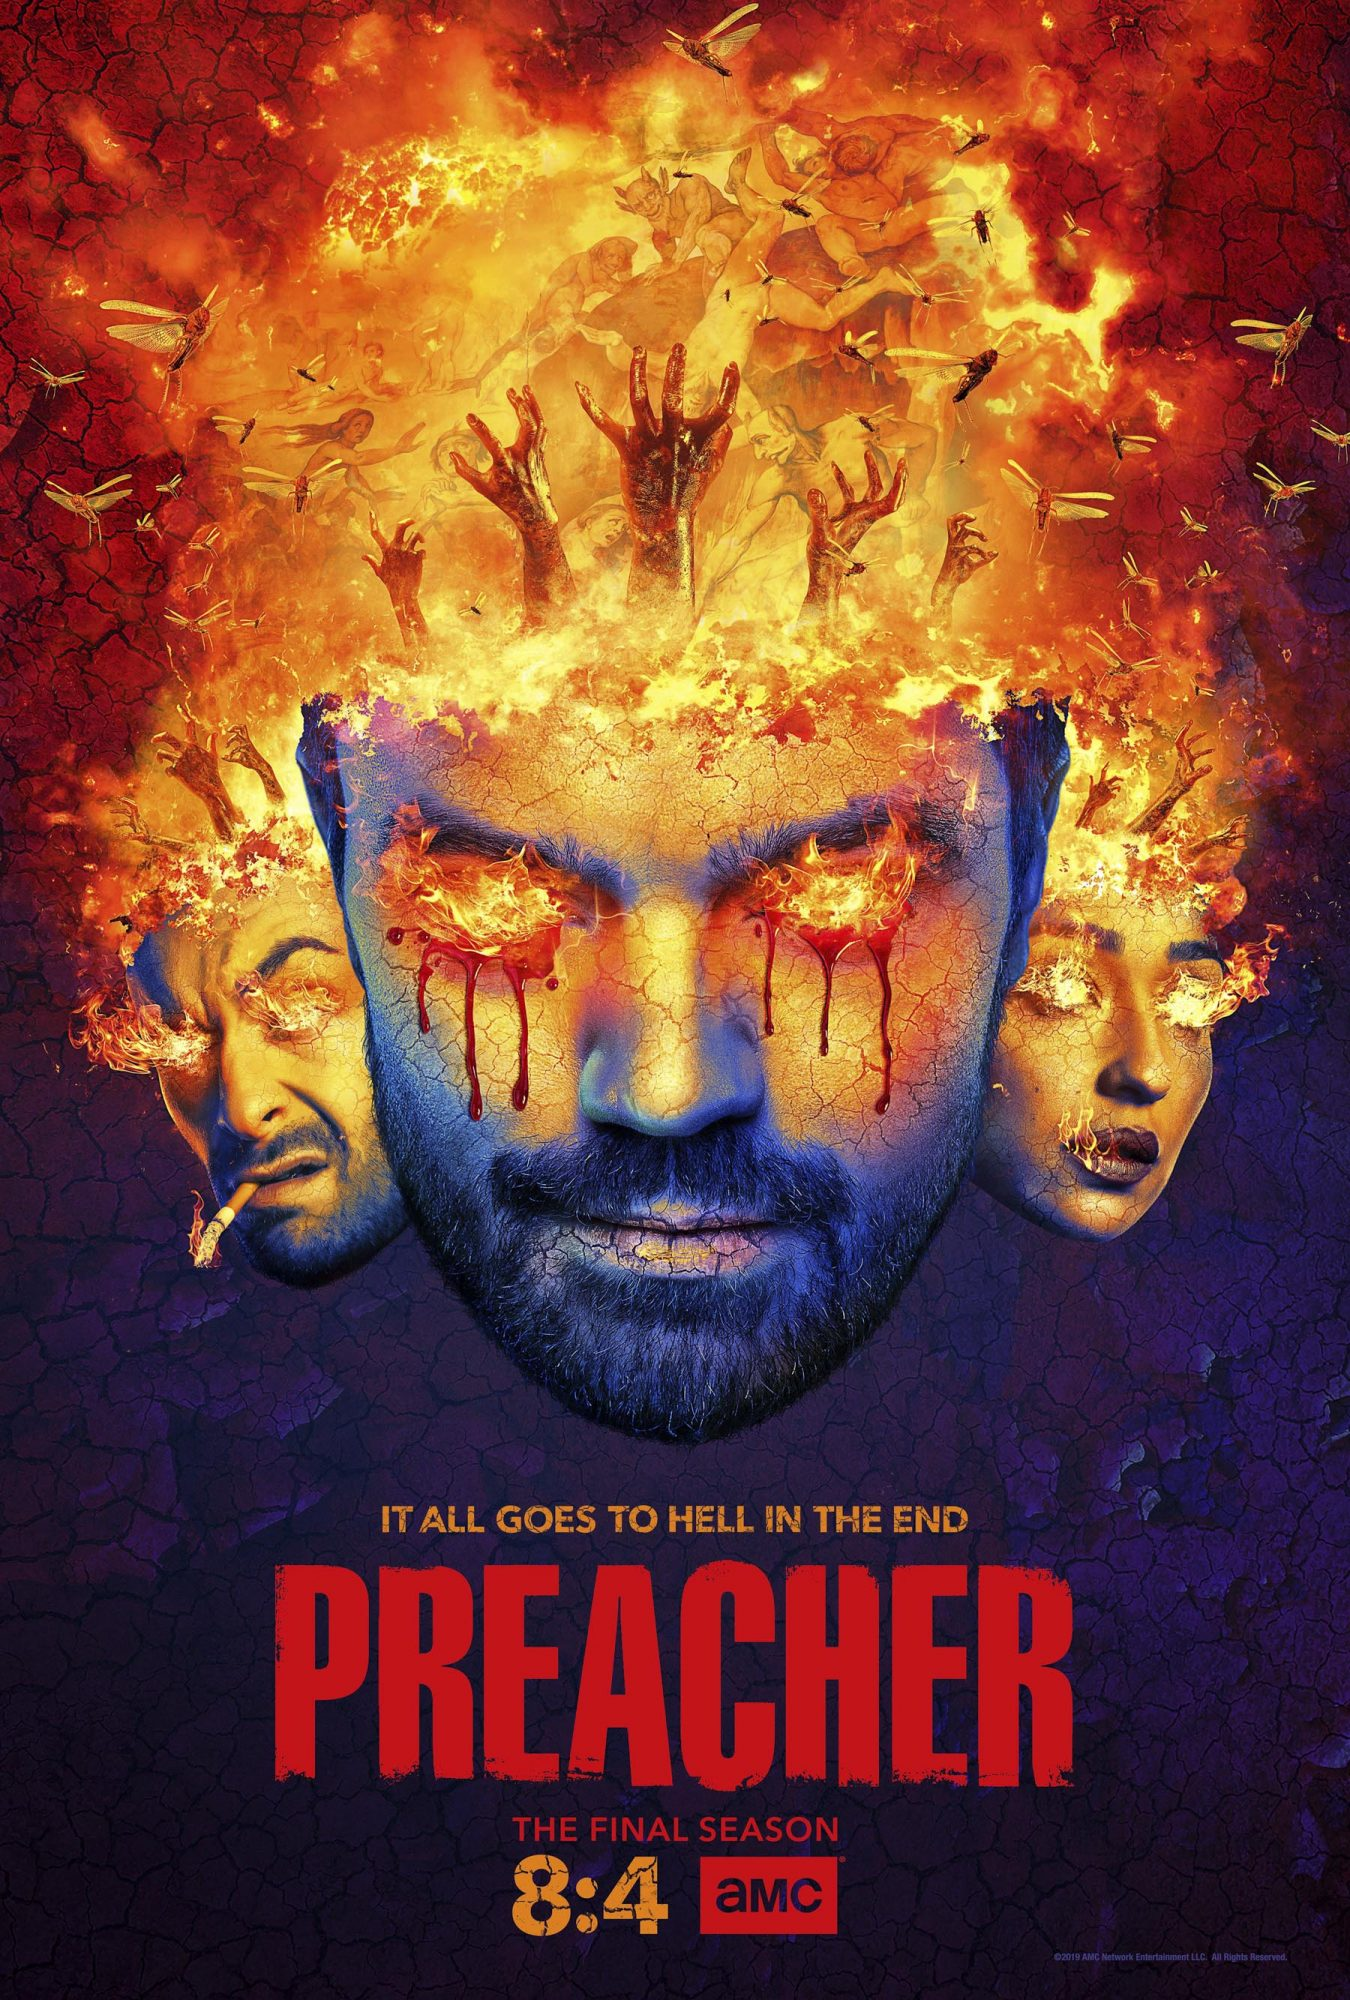 The Preacher Season 4 key art CR: AMC